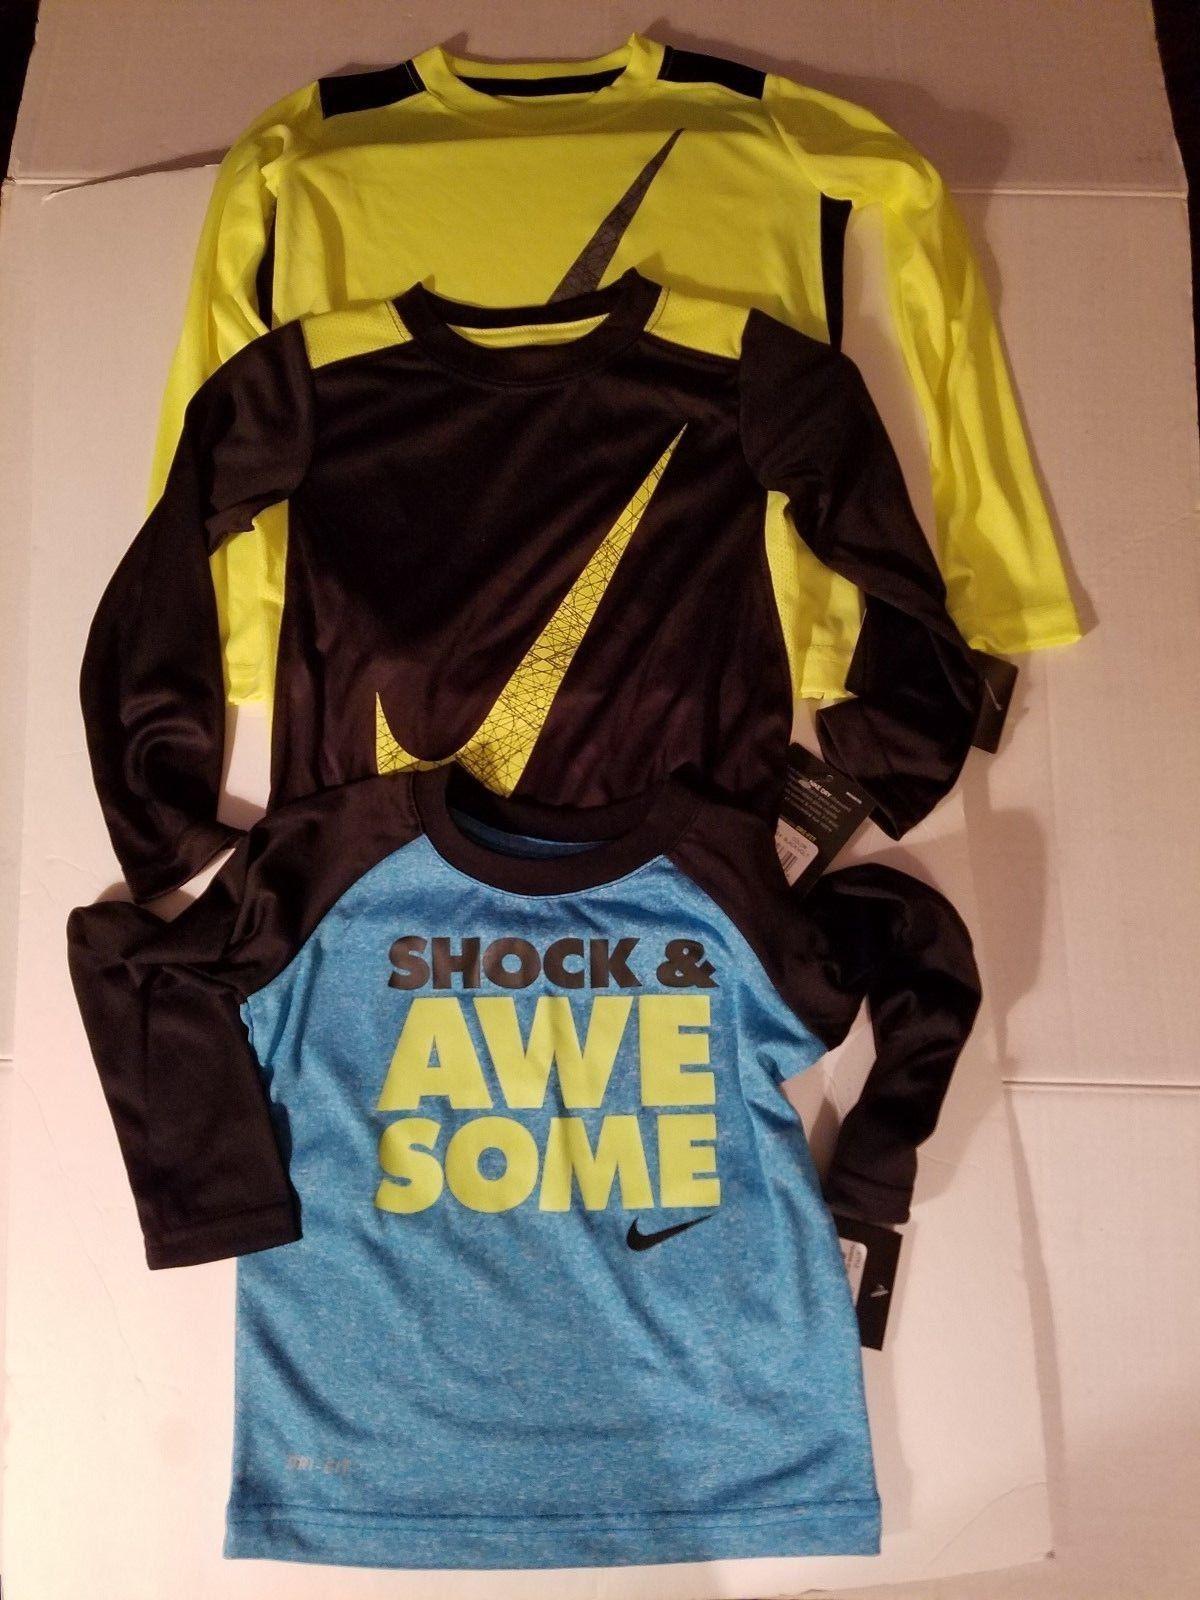 4ad19d969d 57. 57. Previous. Nike Toddler Boys Dri Fit Long Sleeve Shirts Size 2T 4T  NWT. Nike Toddler Boys Dri ...